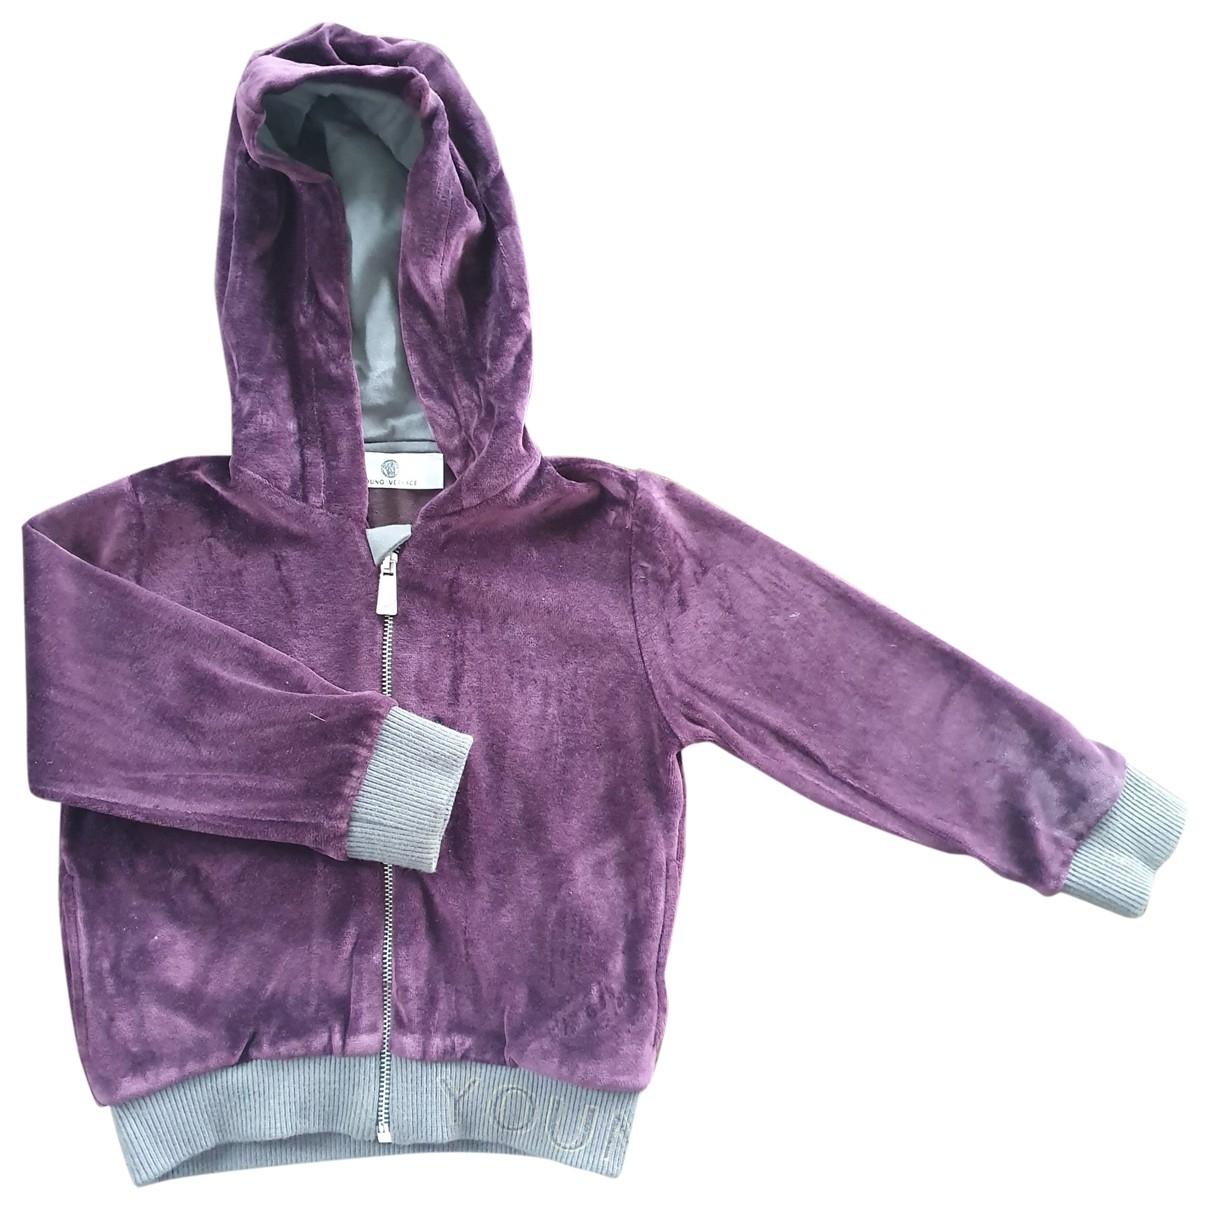 Versace \N Burgundy Velvet Knitwear for Kids 18 months - up to 81cm FR